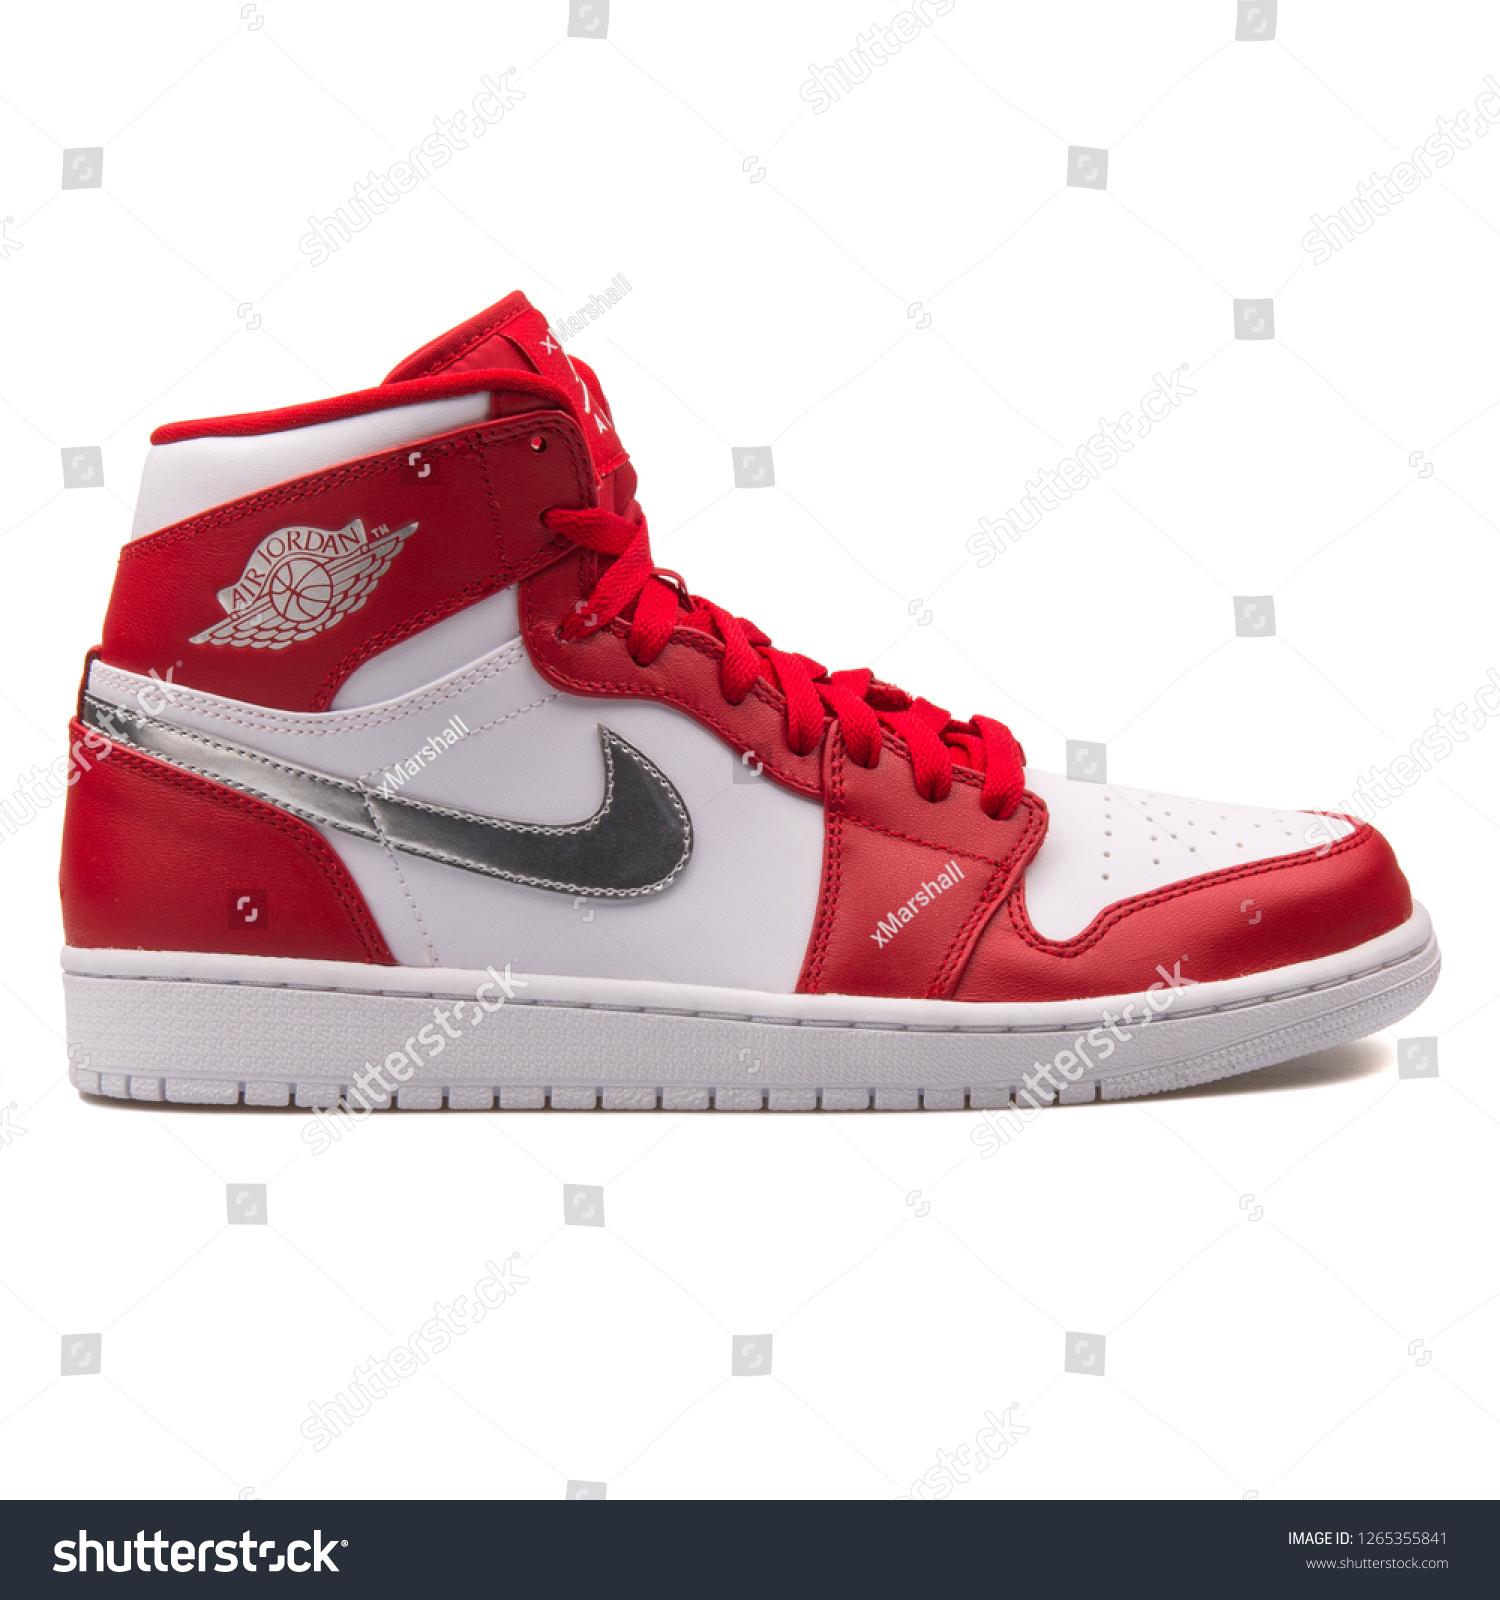 ebd3ffca15391 VIENNA AUSTRIA JUNE 14 2017 Nike Stock Photo (Edit Now) 1265355841 ...